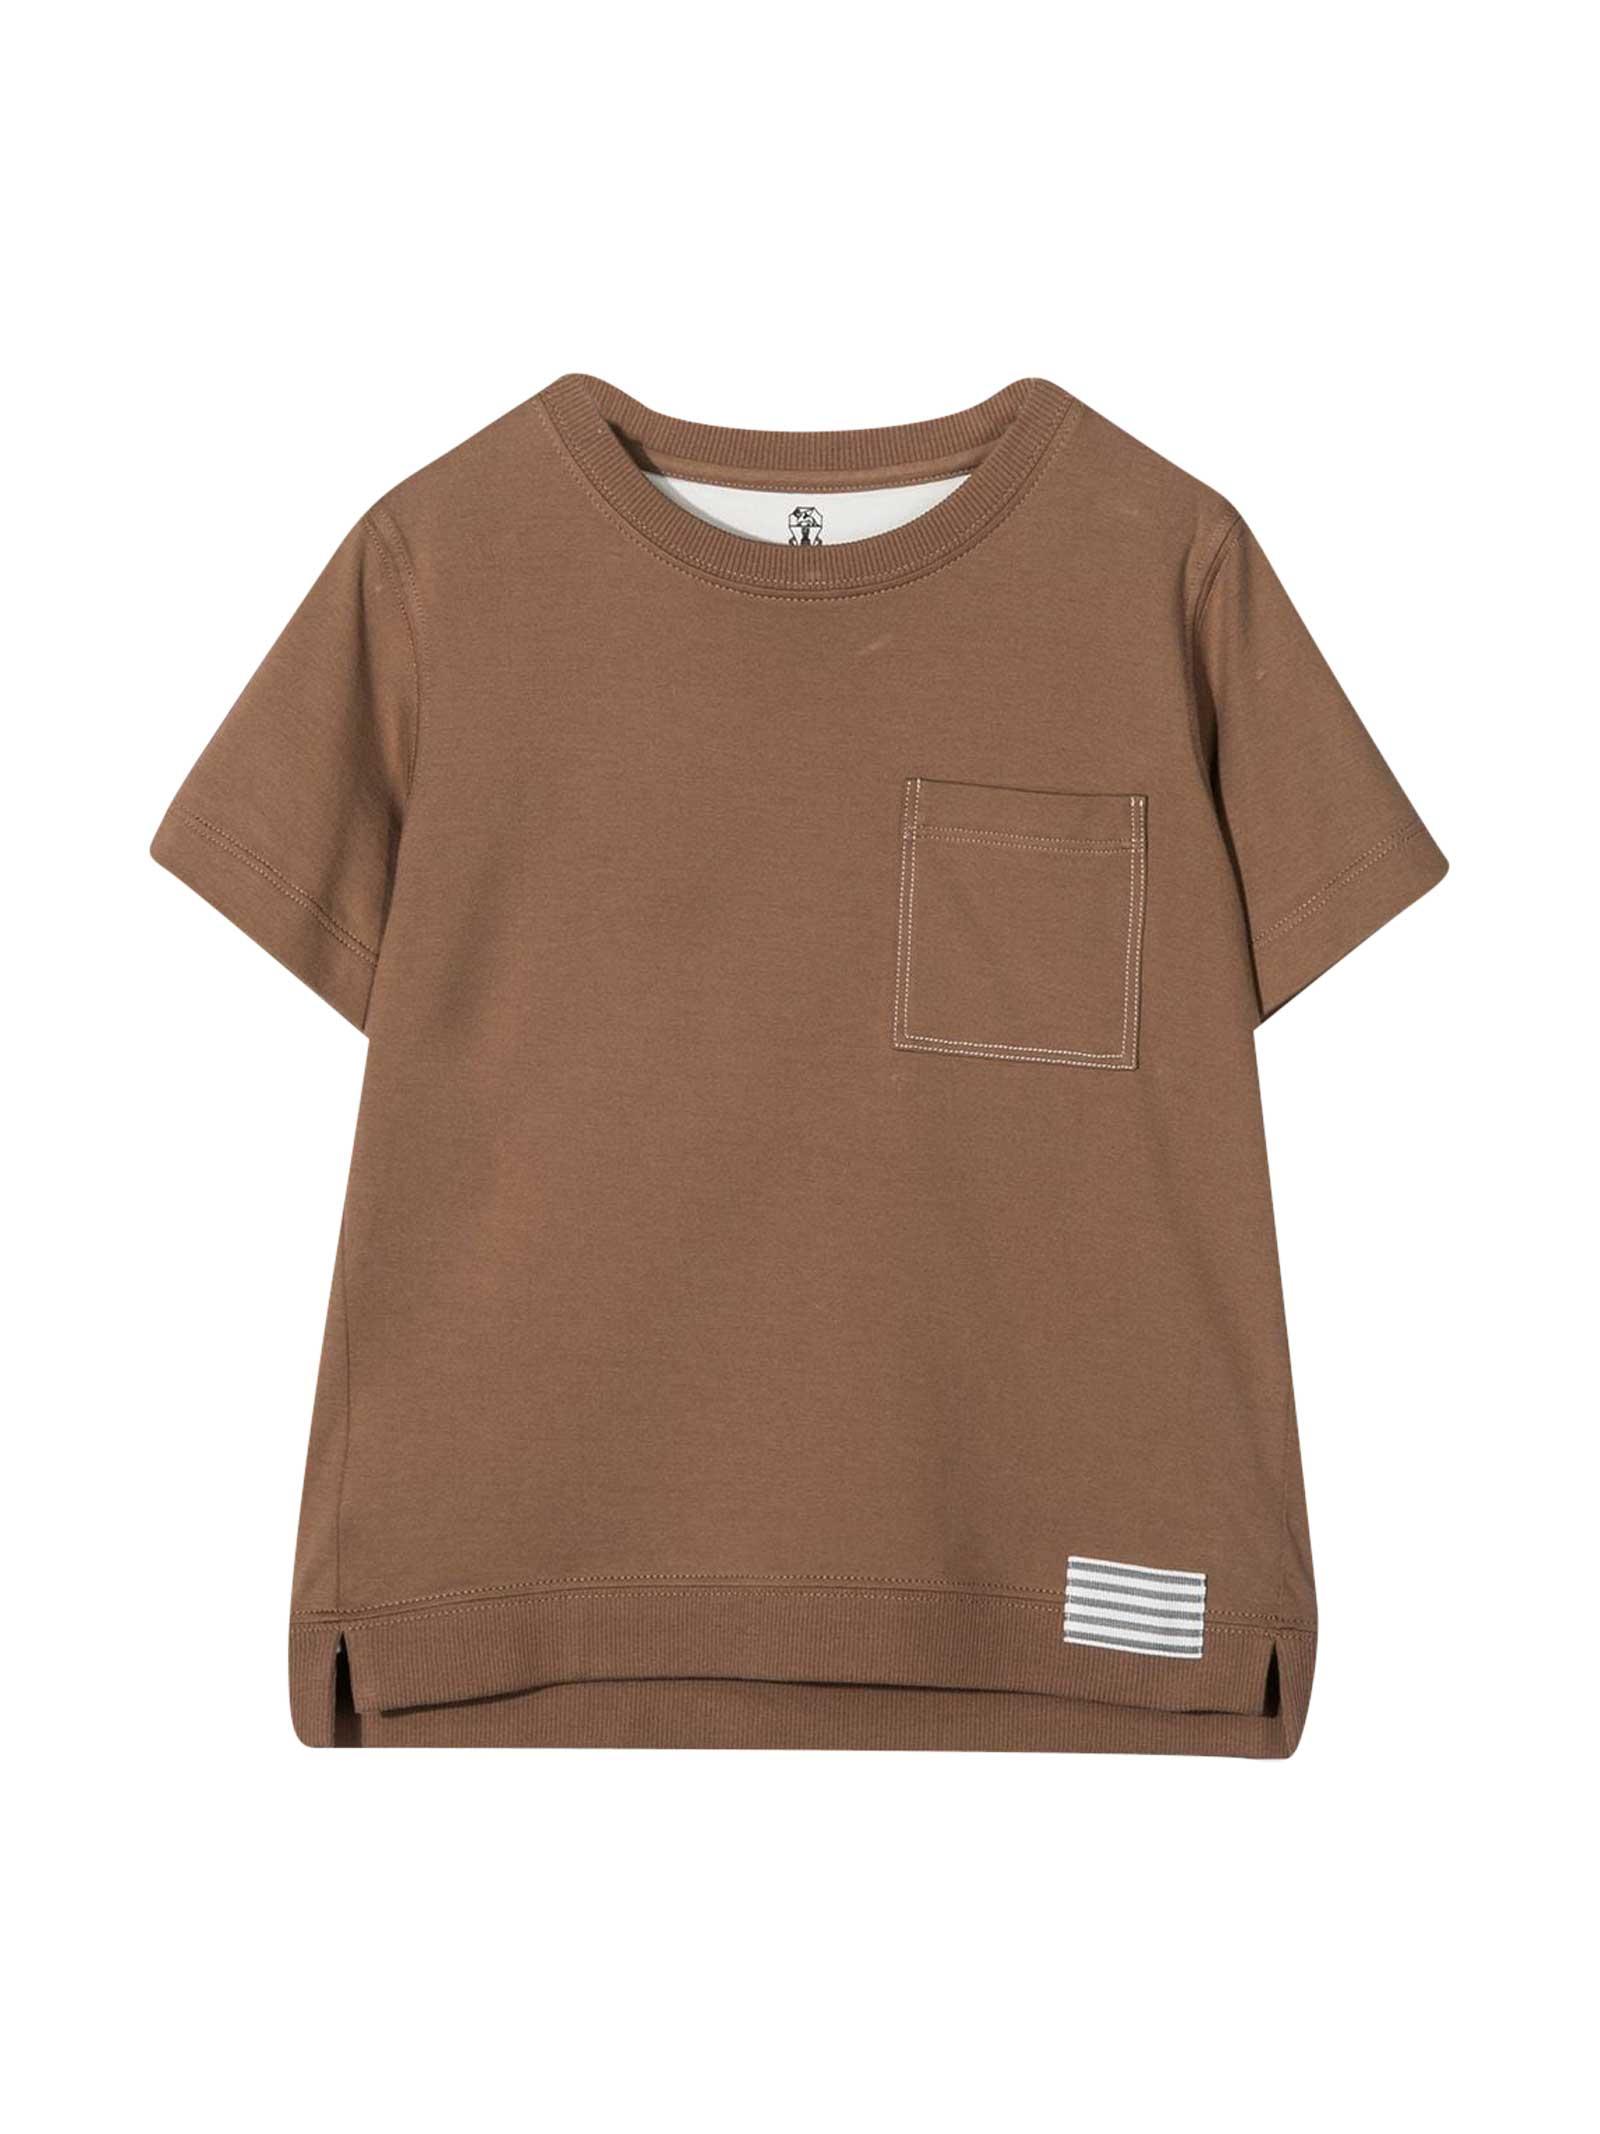 Brunello Cucinelli T-shirts COCOA T-SHIRT TEEN